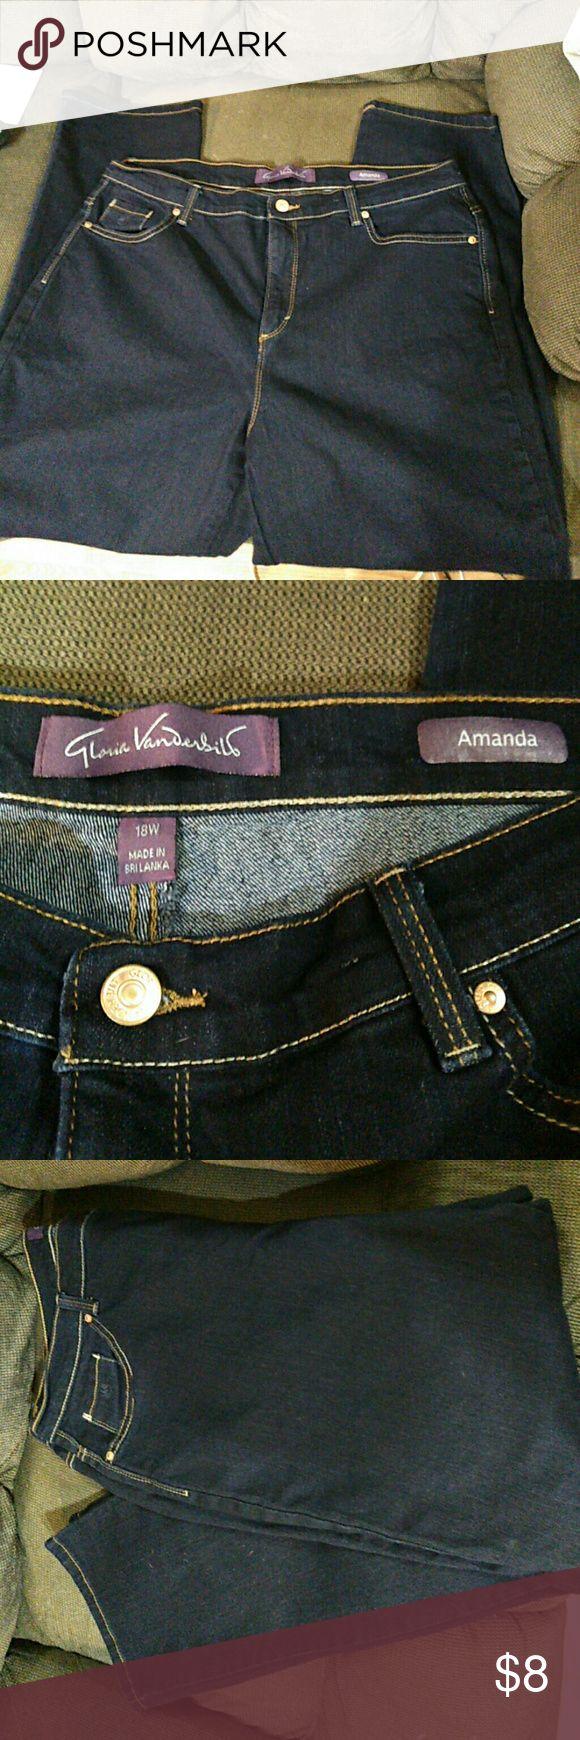 Duke men s strong buckle jeans cargo amp trouser rawhide leather belt - Gloria Vanderbuilt Amanda Jeans 18w